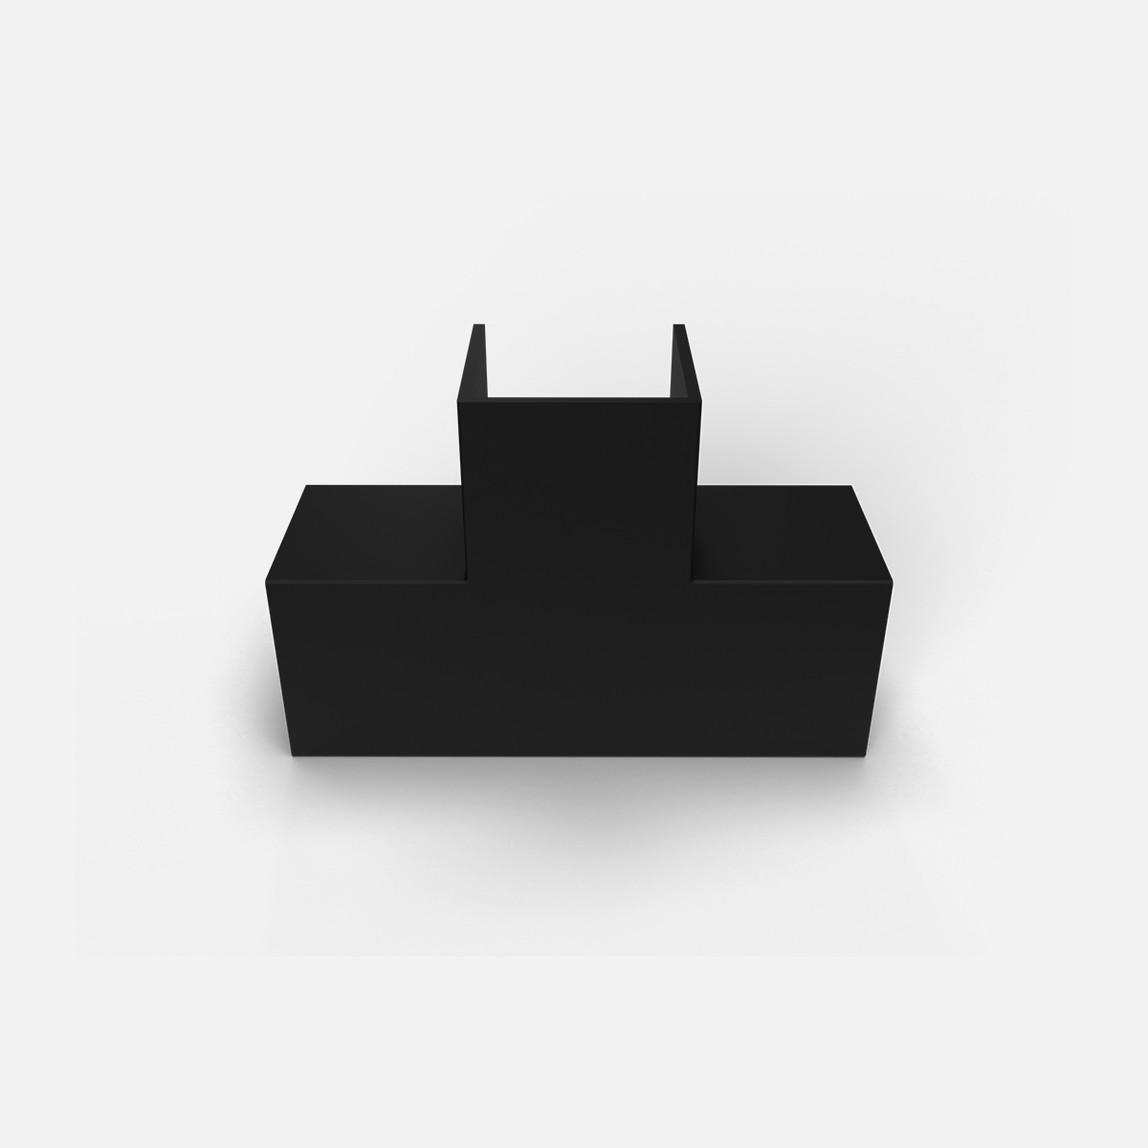 25X25 T-L Köşe Siyah